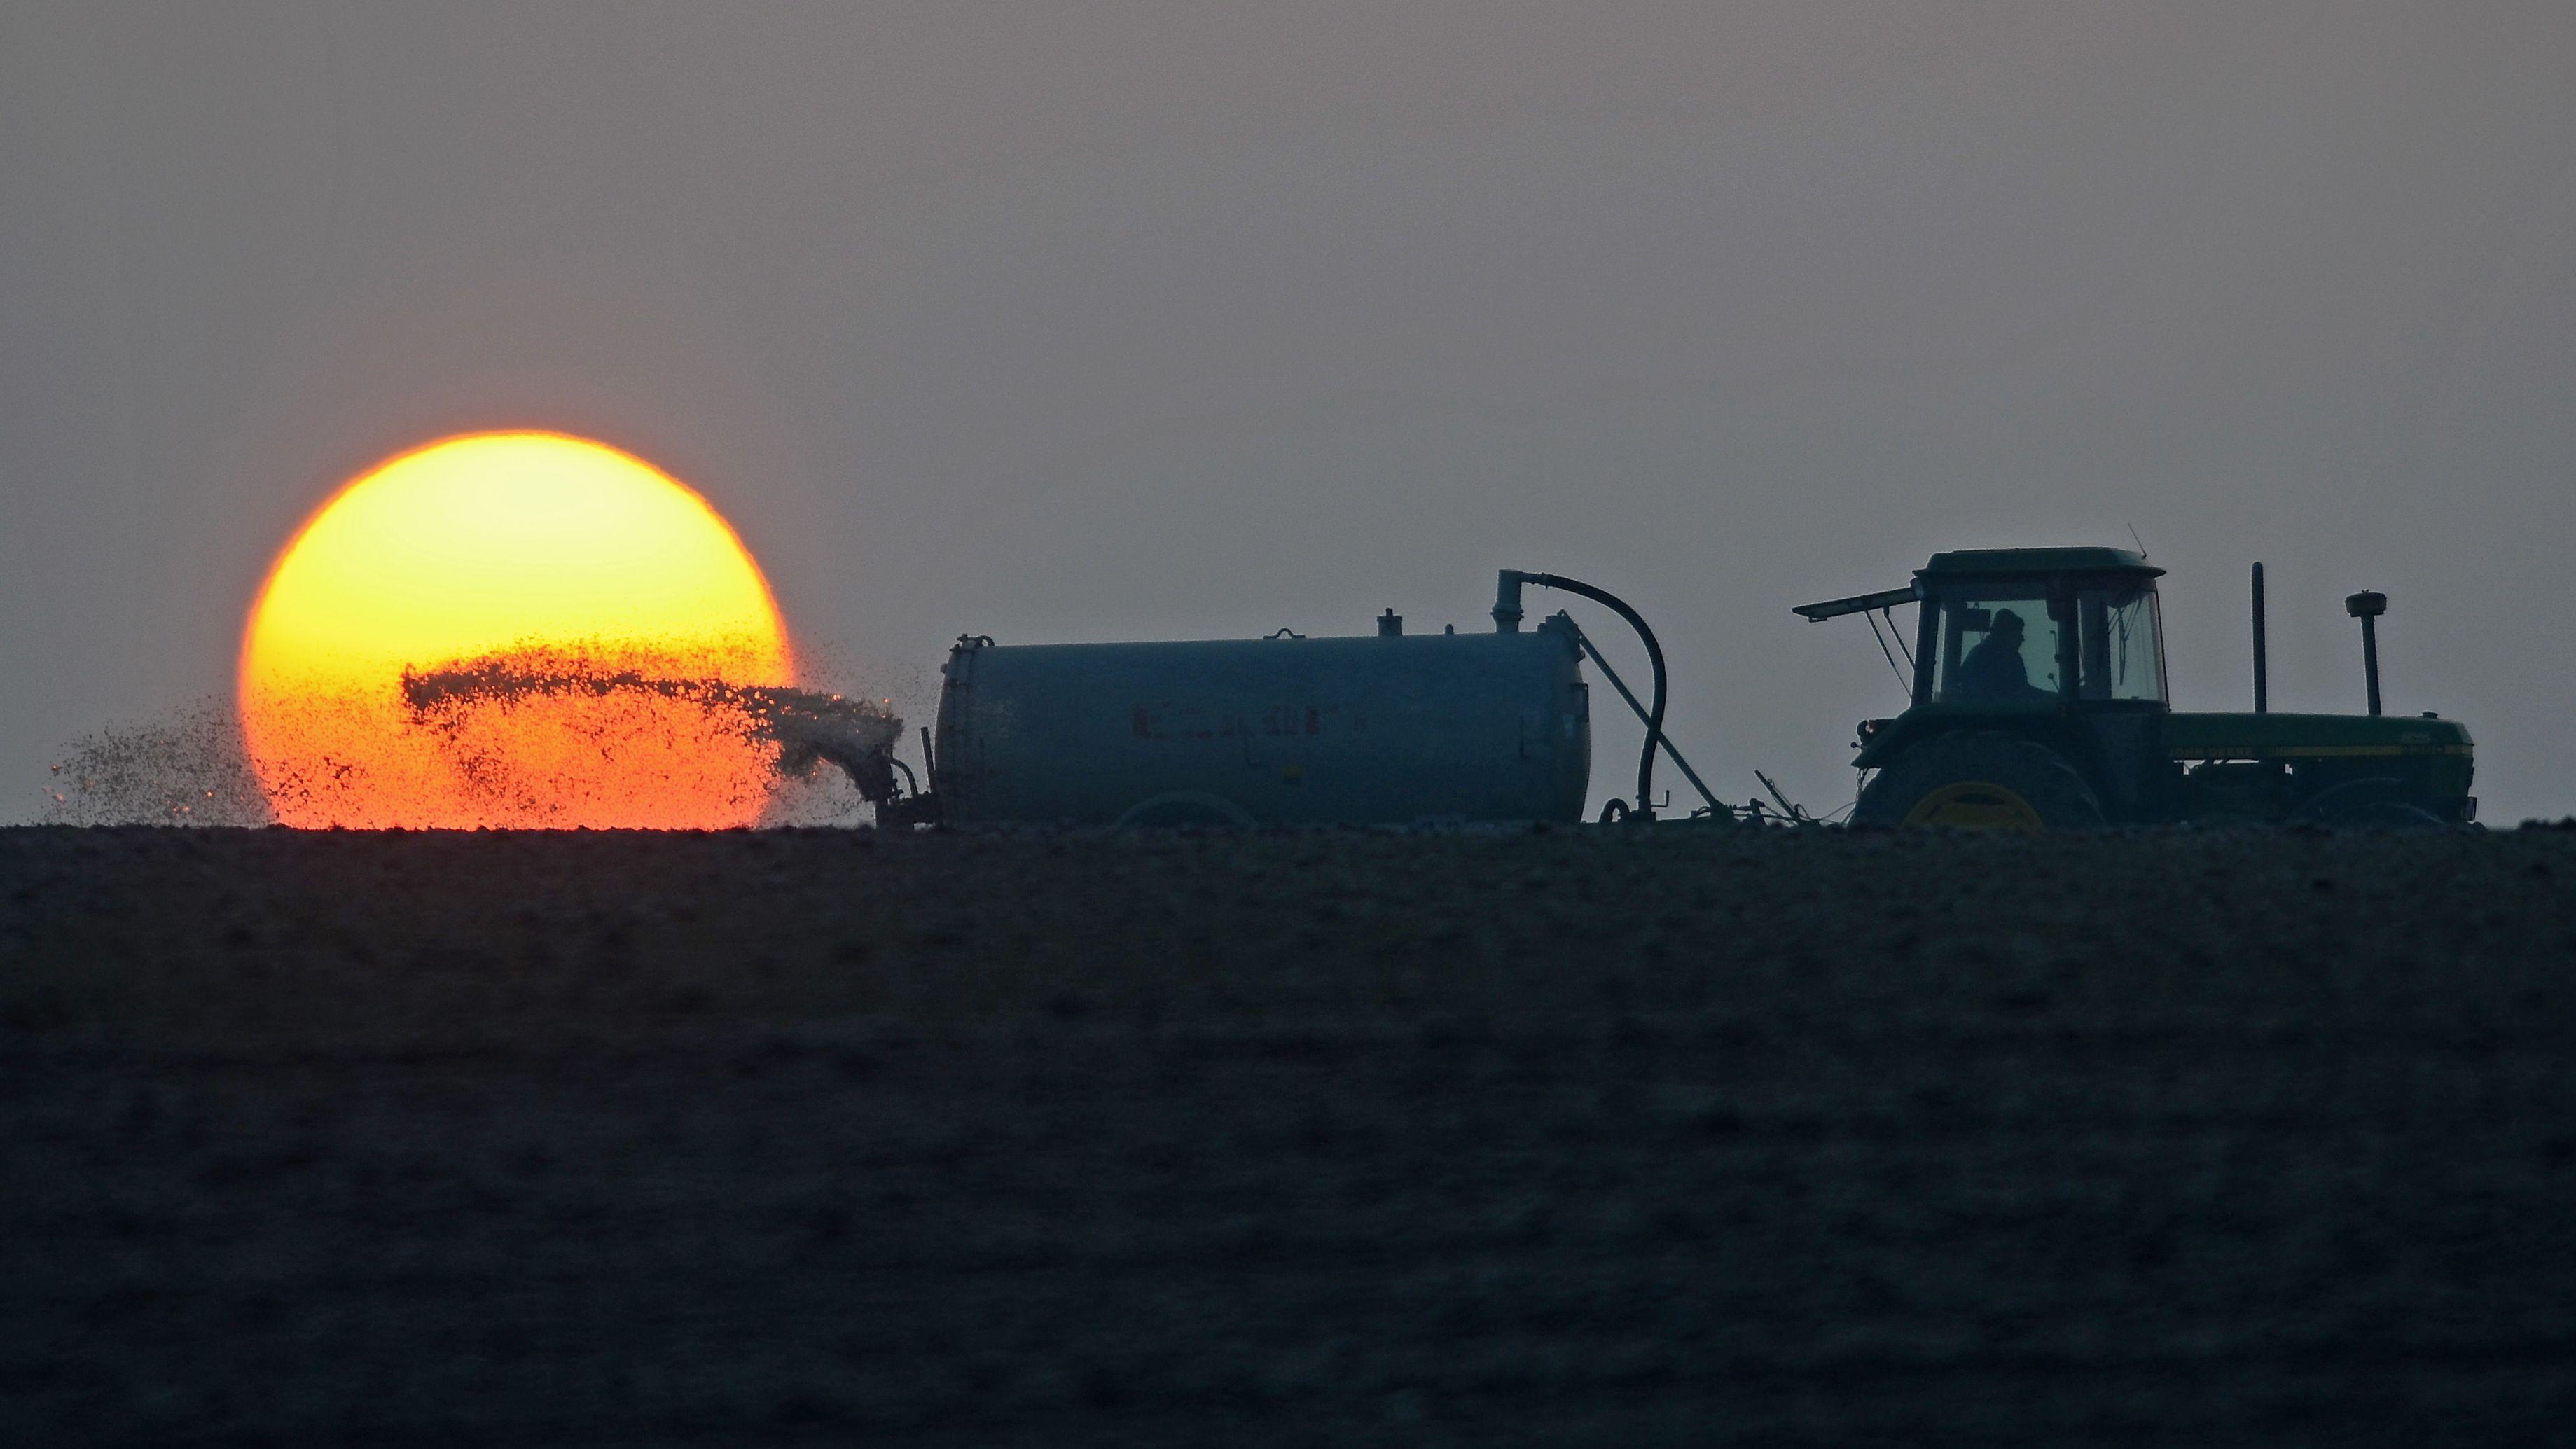 Traktor bringt vor Sonnenuntergang Gülle aufs Feld